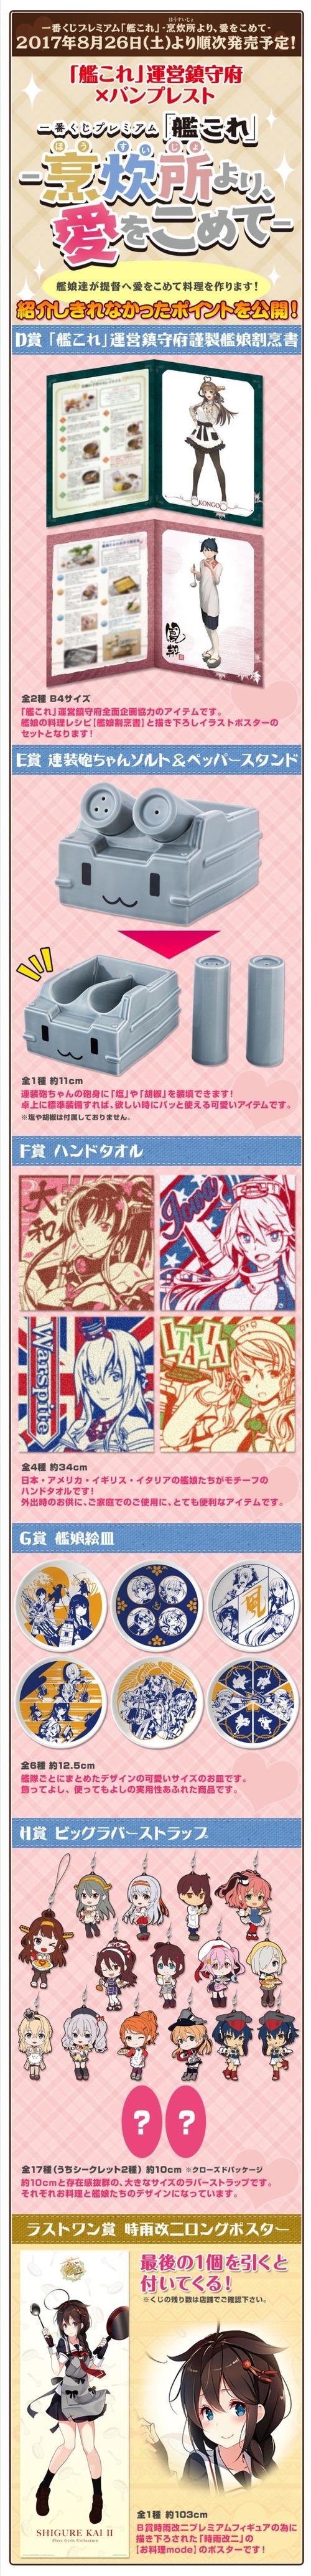 screencapture-bpnavi-jp-kuji-item-2094-1503647627433